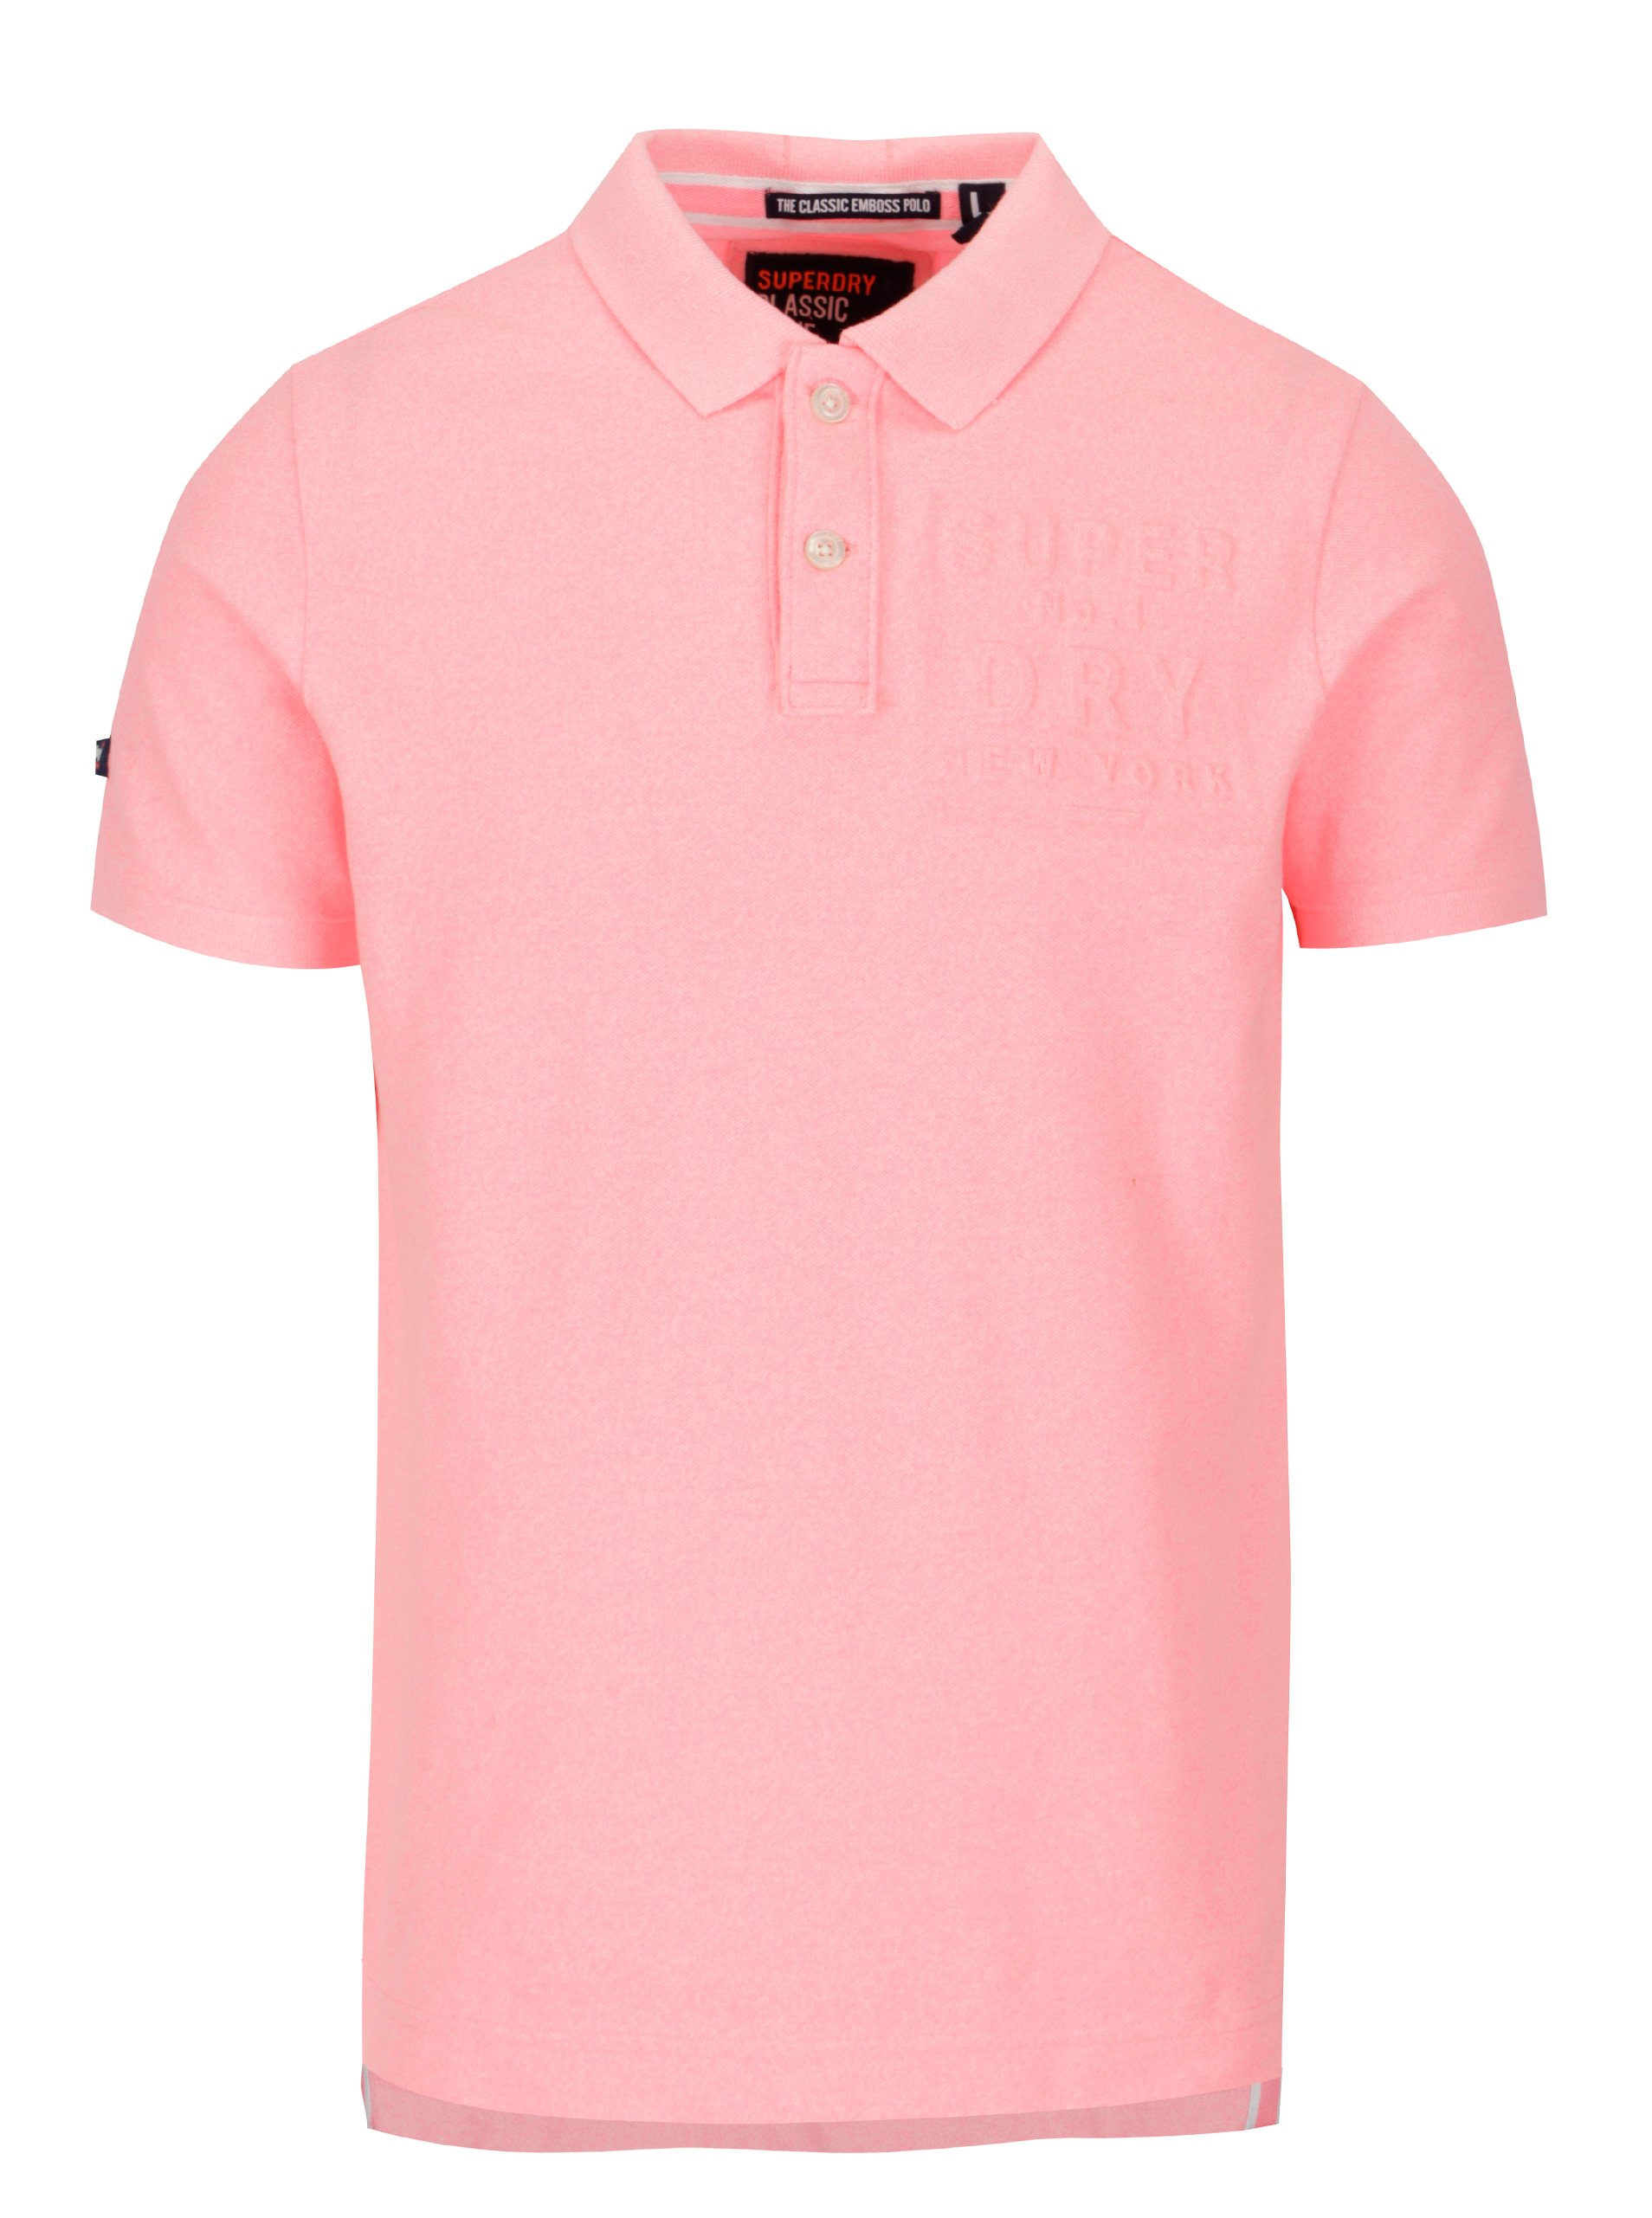 fa0bafa533dc Neonově růžové pánské polo tričko Superdry